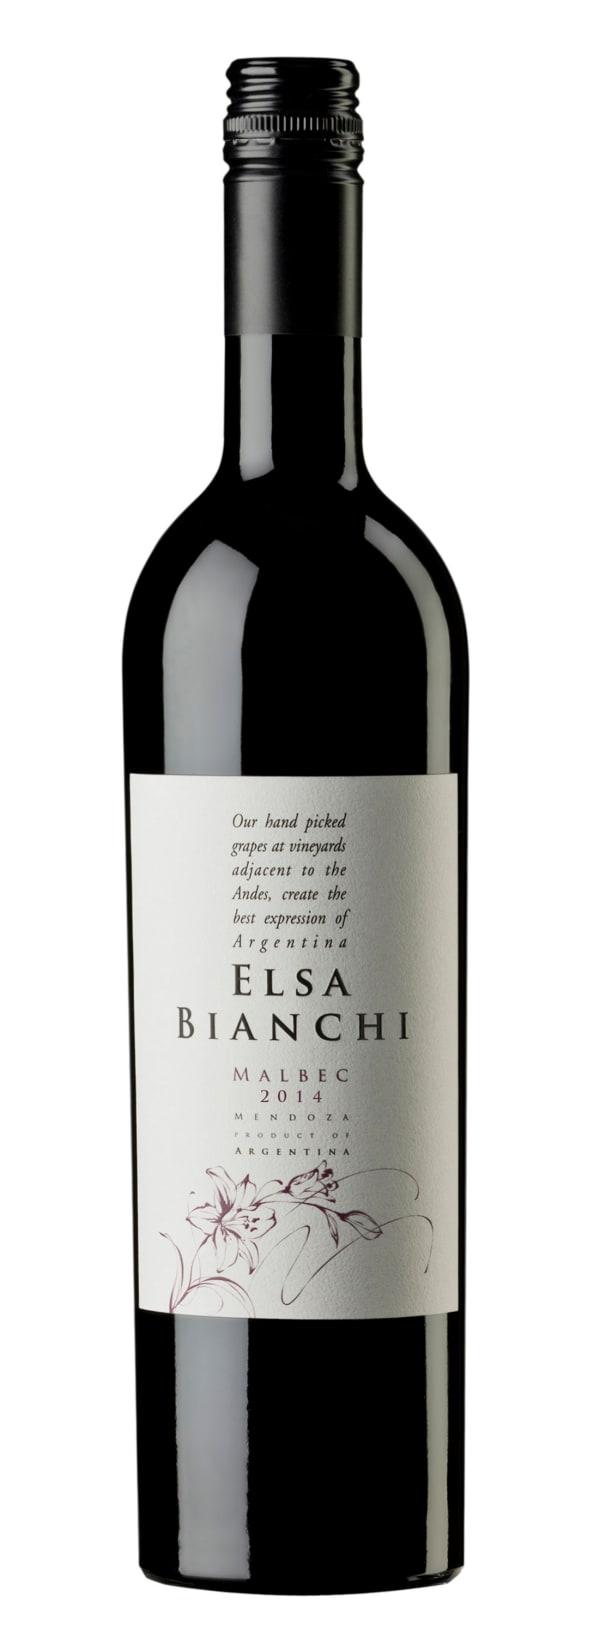 Elsa Bianchi Malbec 2017